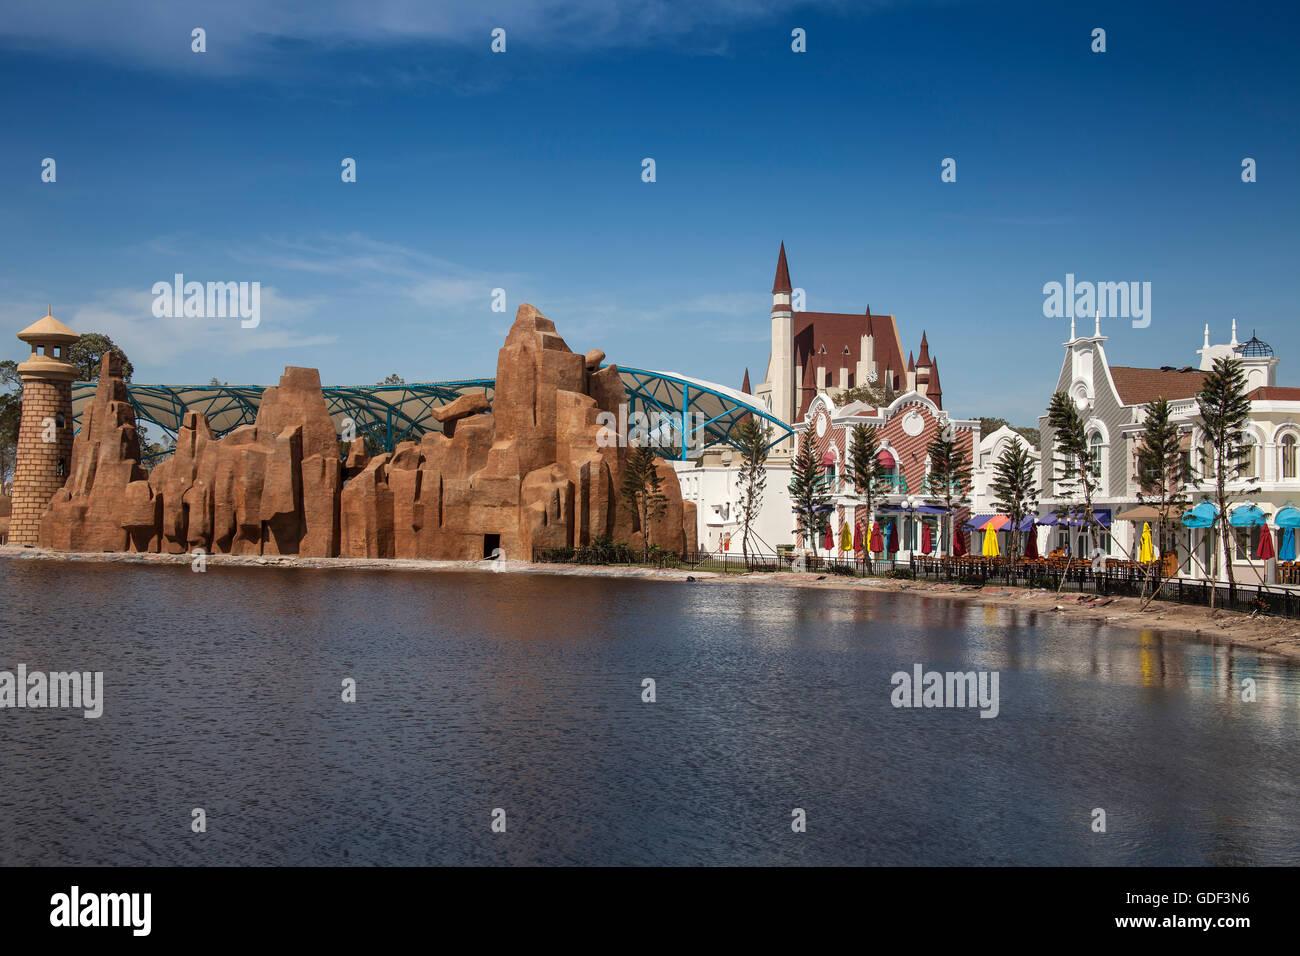 Vinpearl Amusement Park Phu Quoc Phu Quoc Island, Vietnam - Stock Image